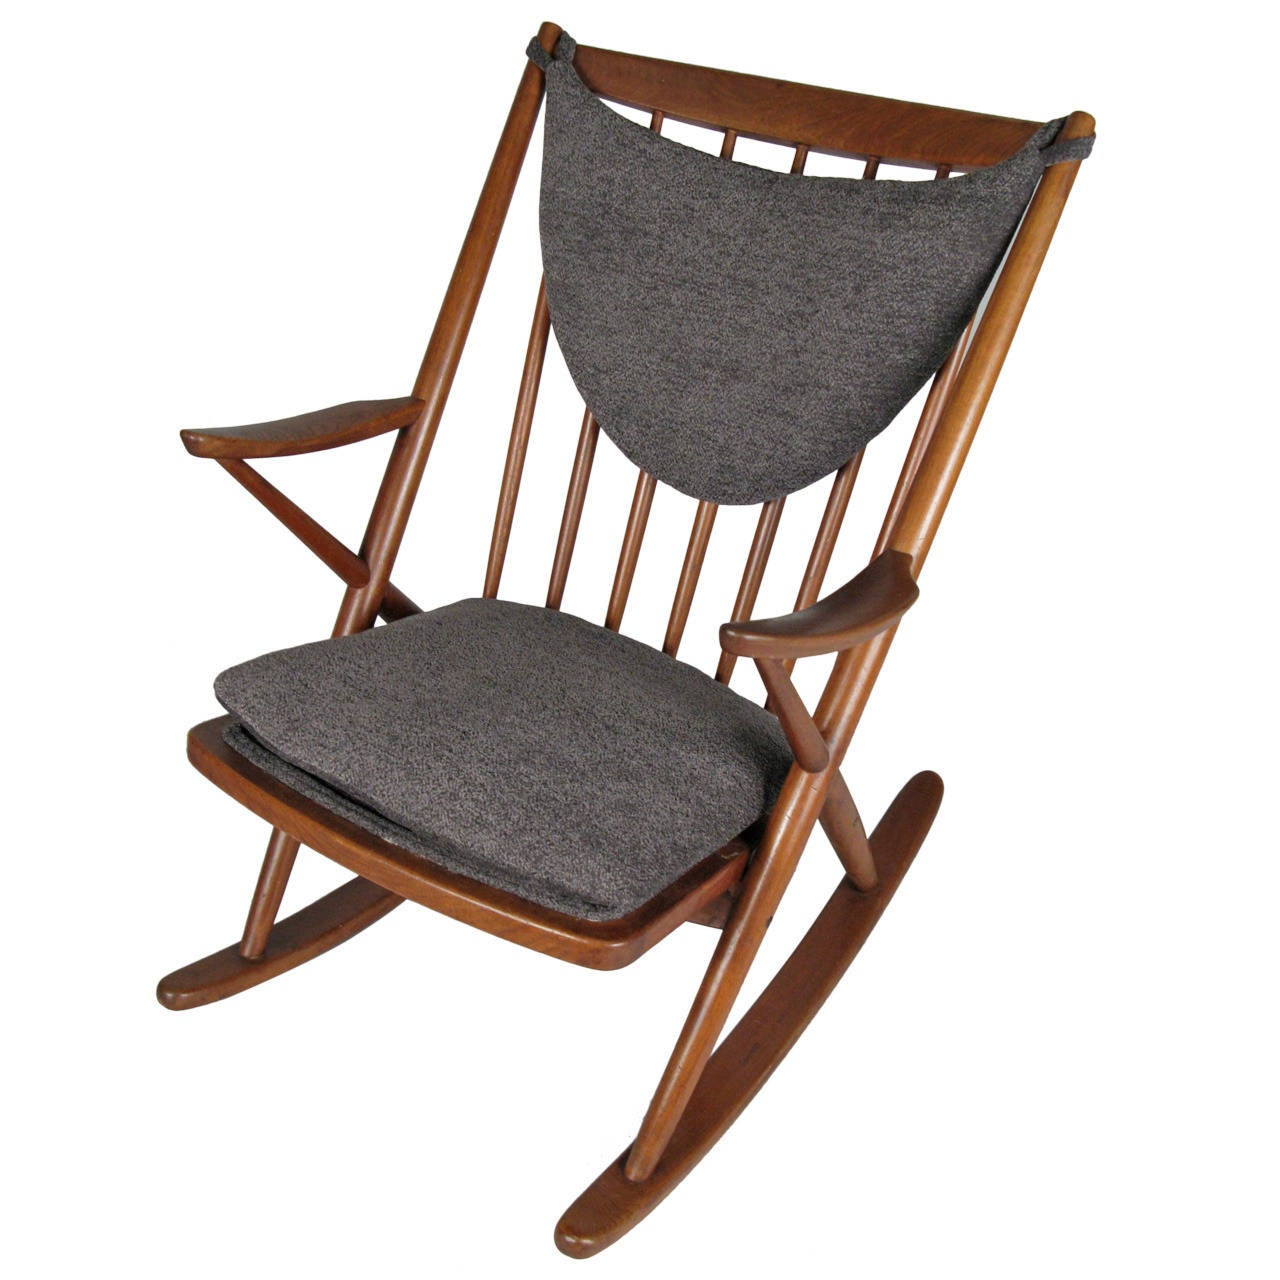 Frank reenskaug rocking chair - 1950s Danish Modern Teak Rocking Chair By Frank Reenskaug 1